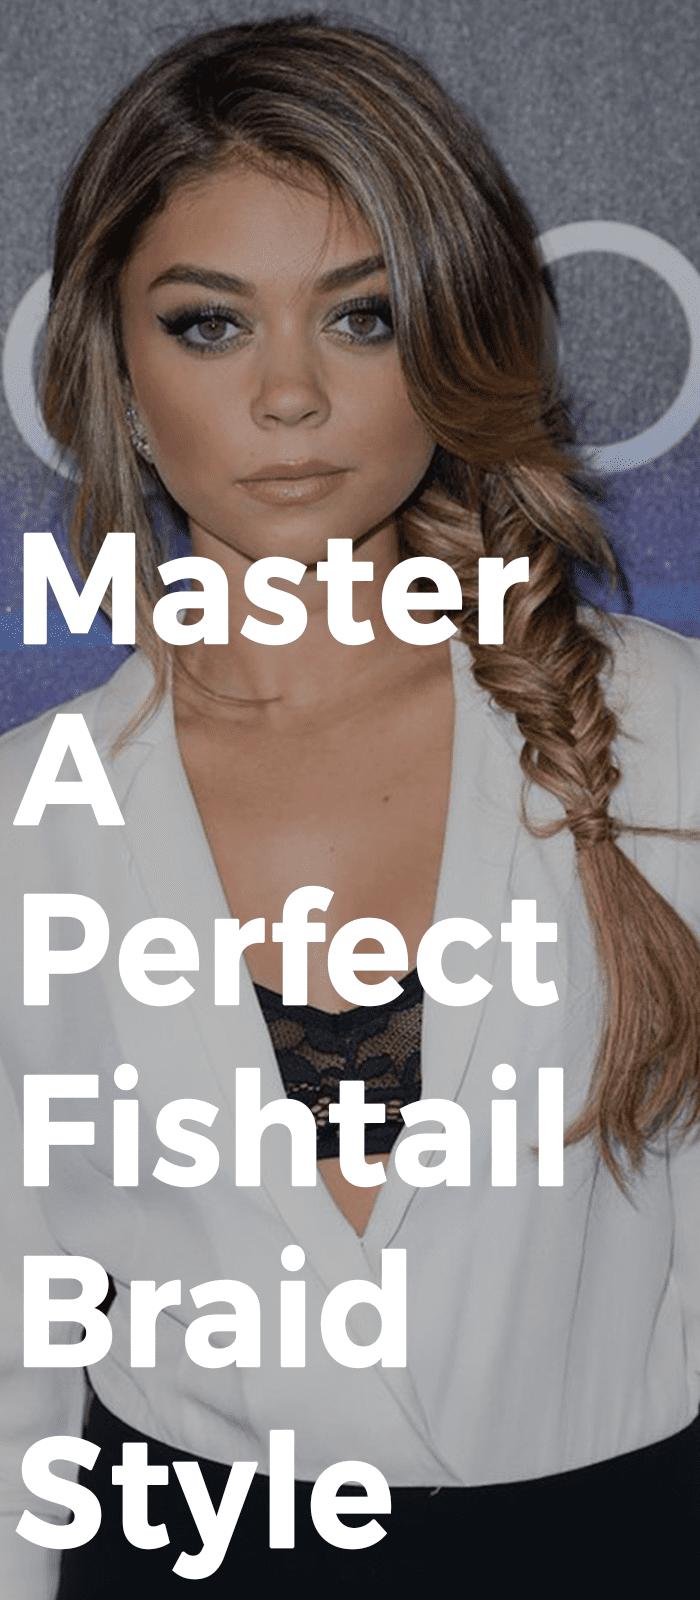 Master A Perfect Fishtail Braid